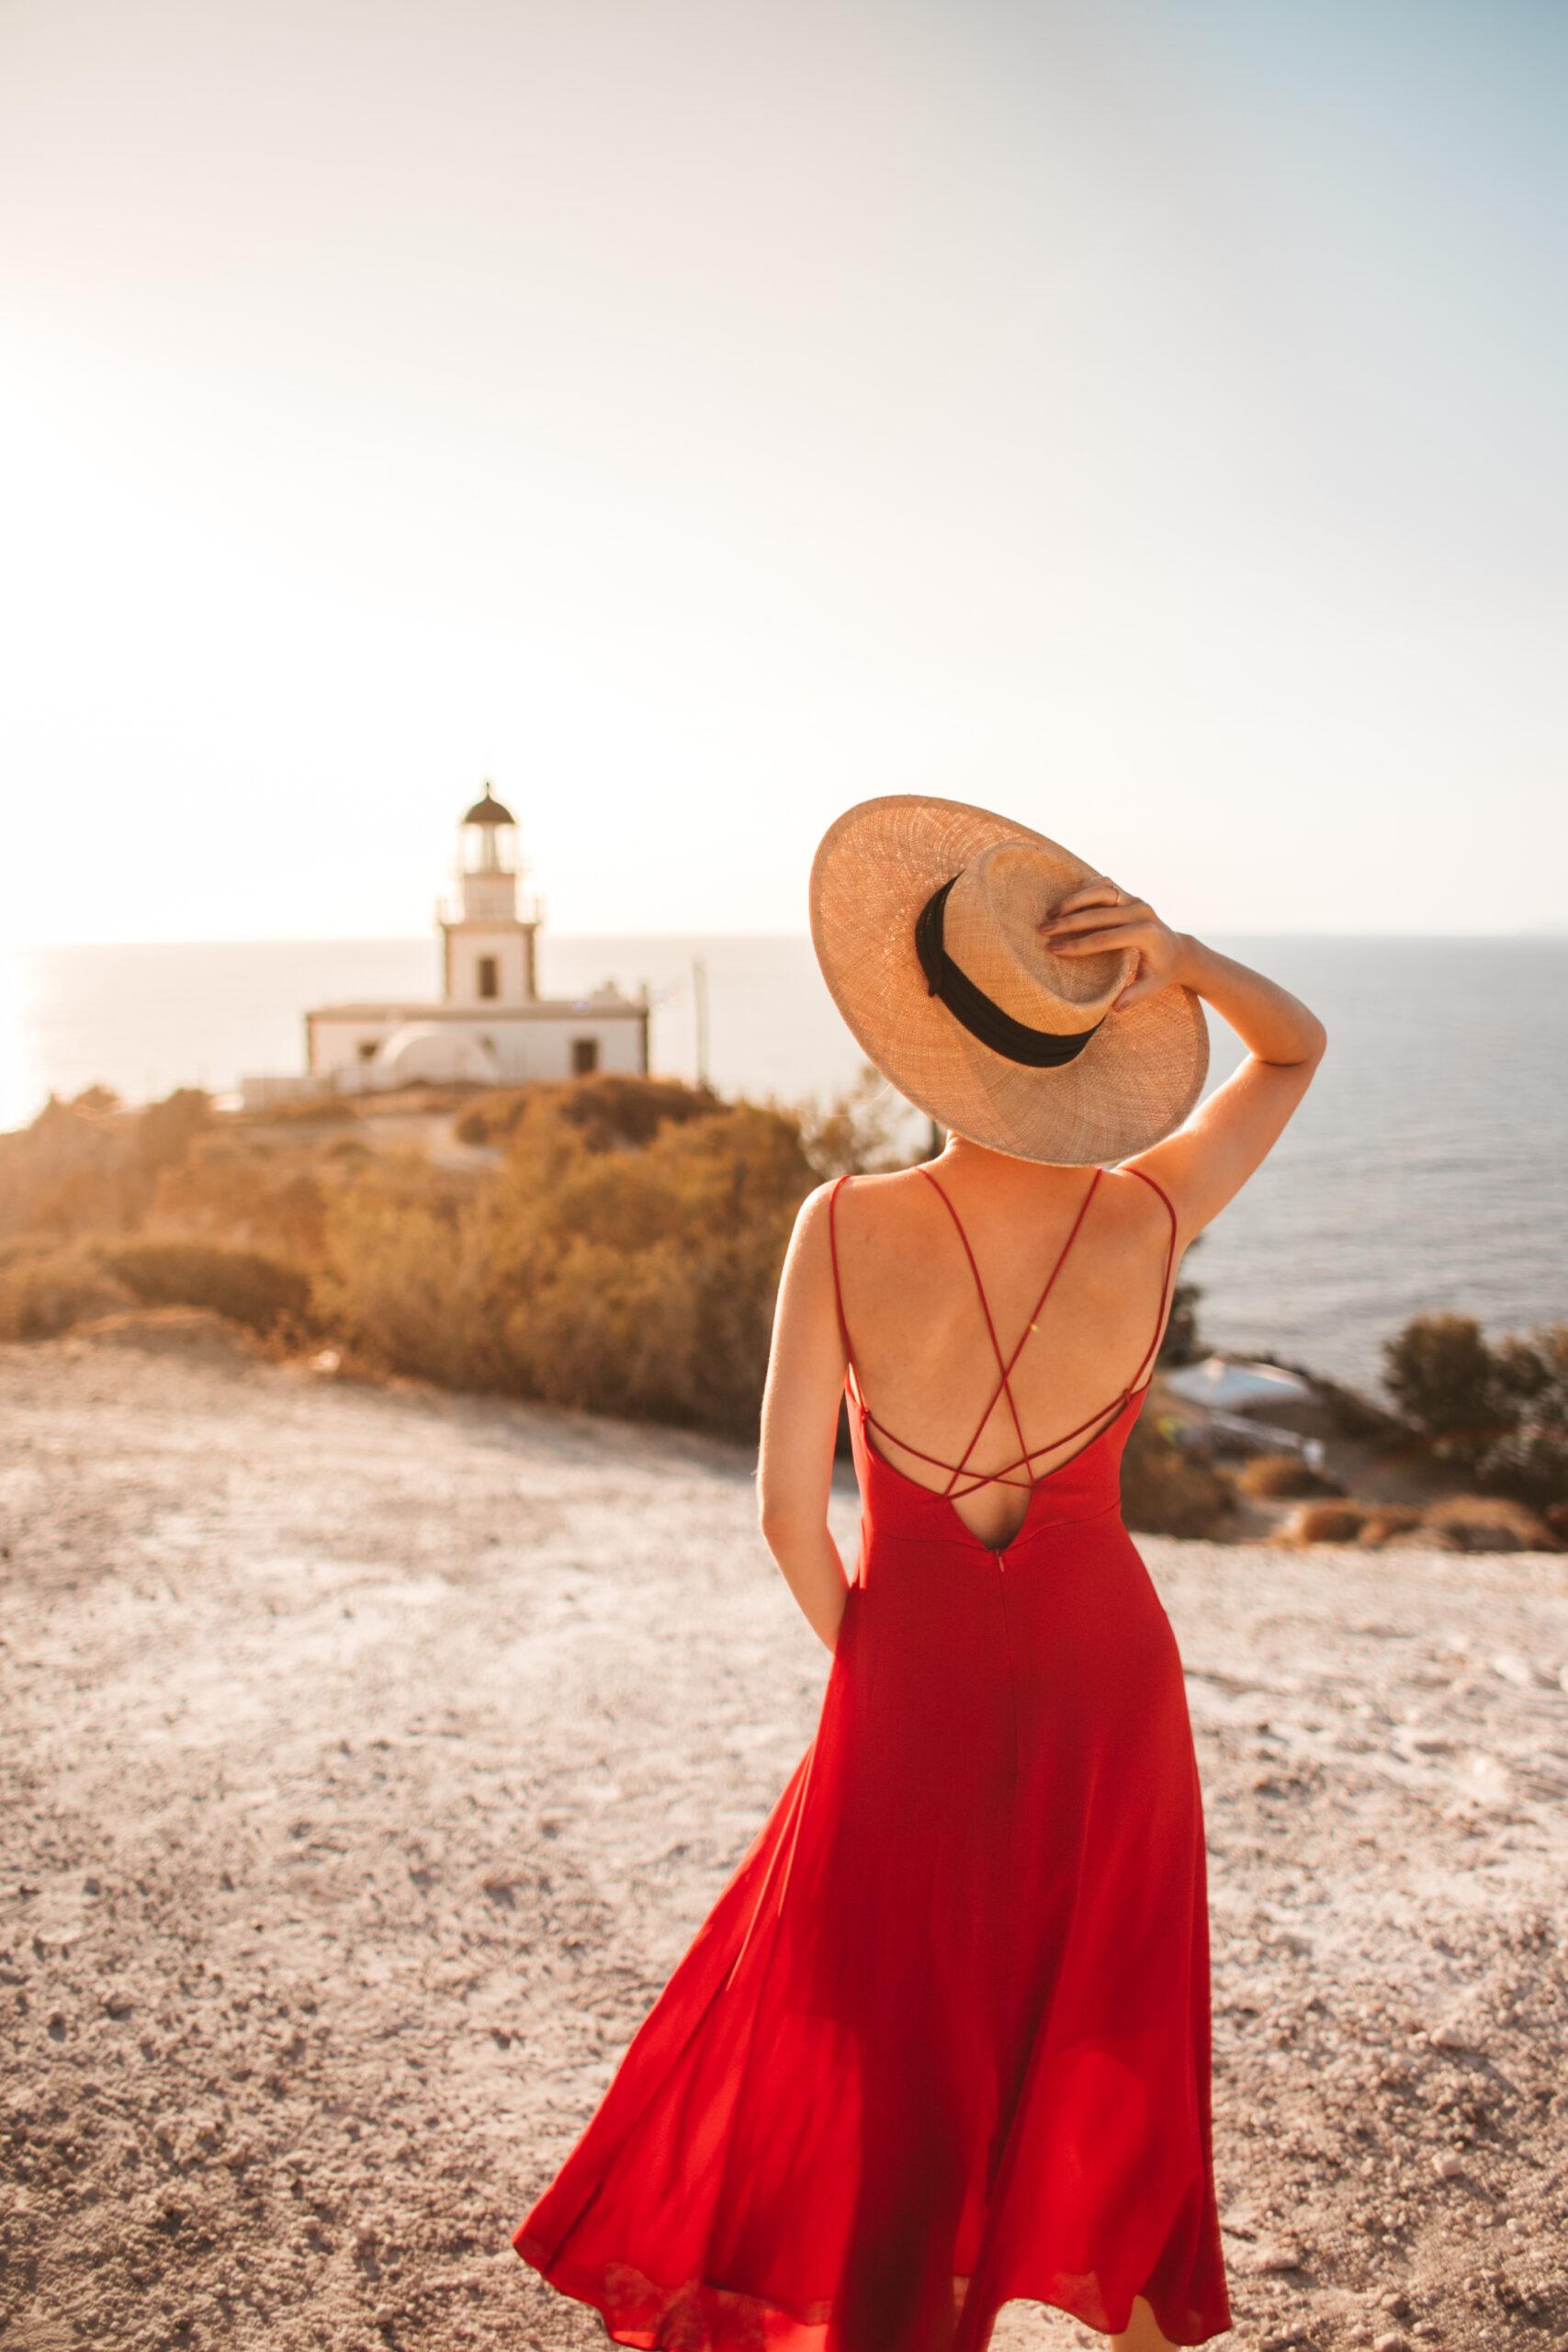 Latarnia Santorini Akrotiri, atrakcje Santorini, blogerka, czerwona suknia, zachód słońca